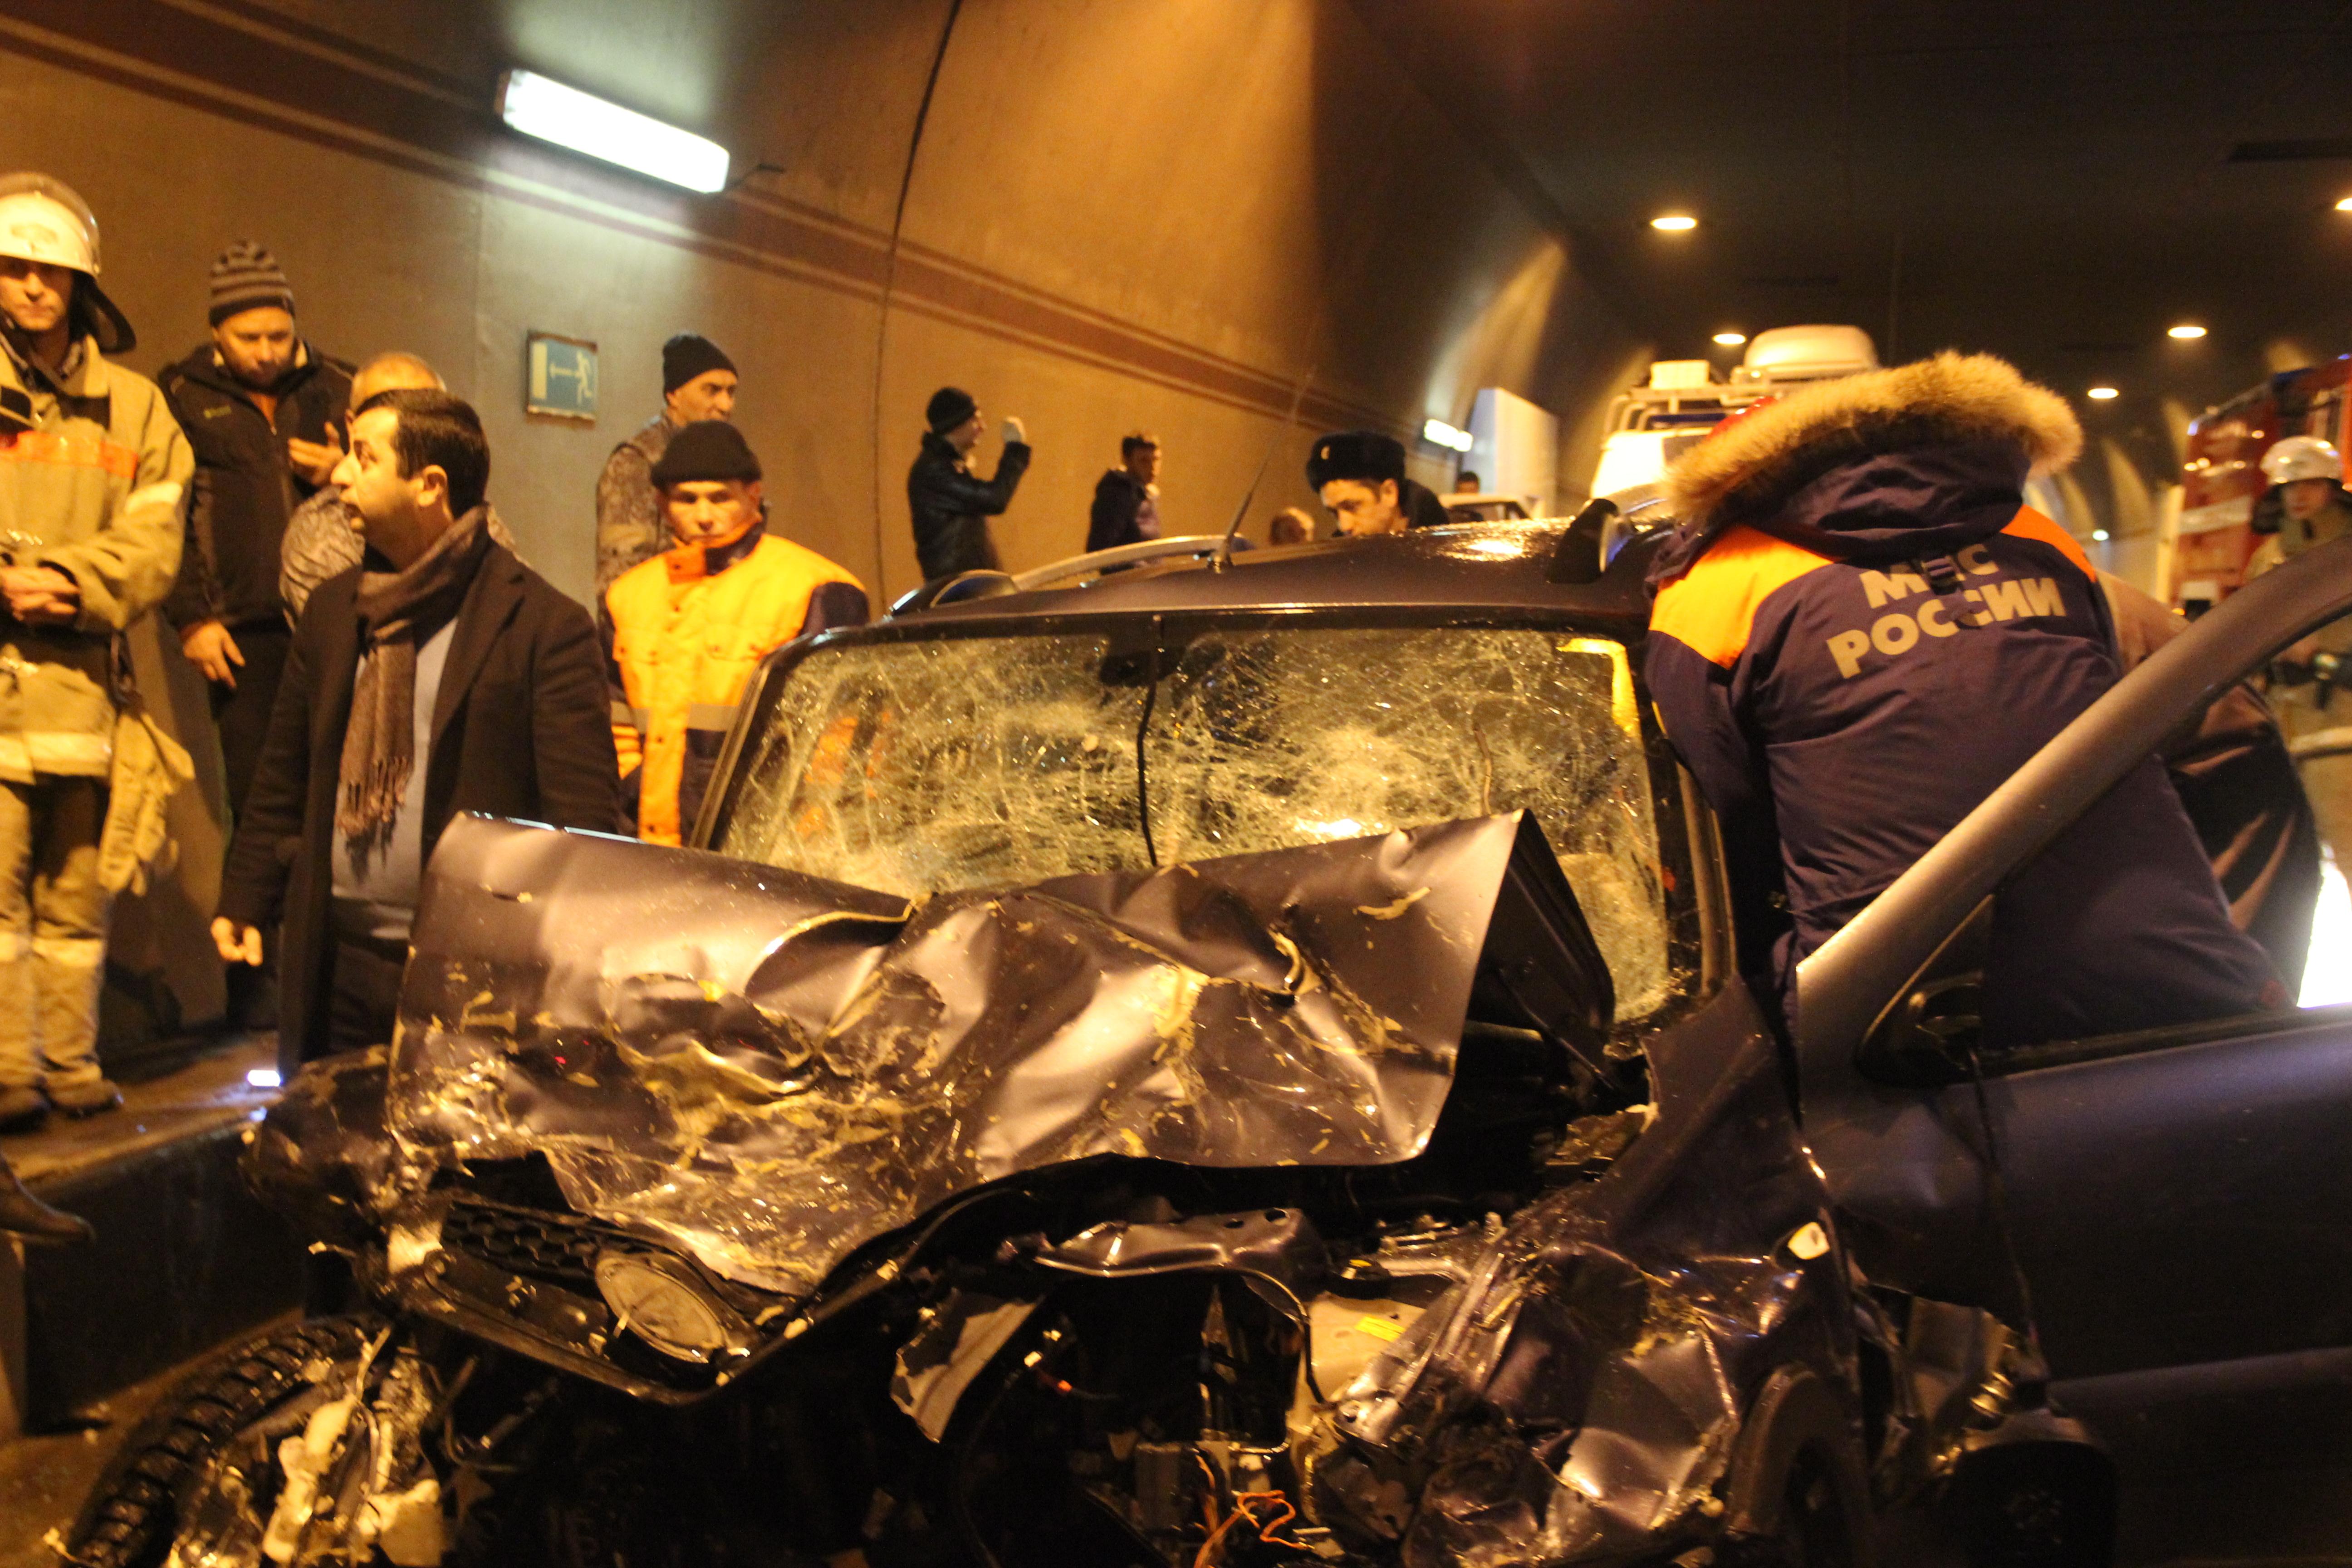 ДТП сучастием 3-х авто случилось вСочи